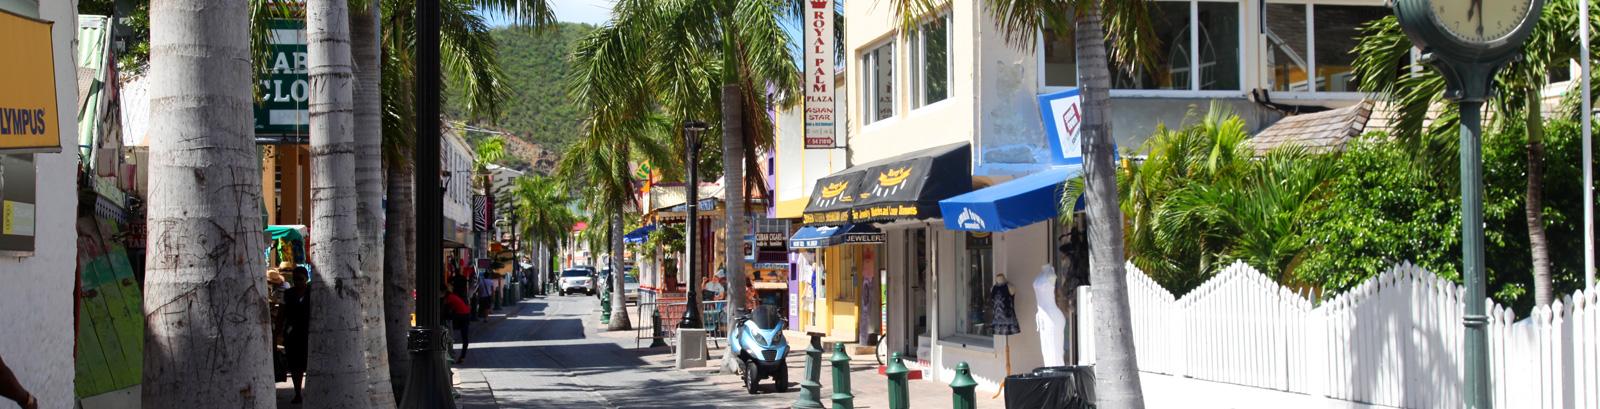 Shipwreck Shops - Nos recommandations au Simpson Bay Resort